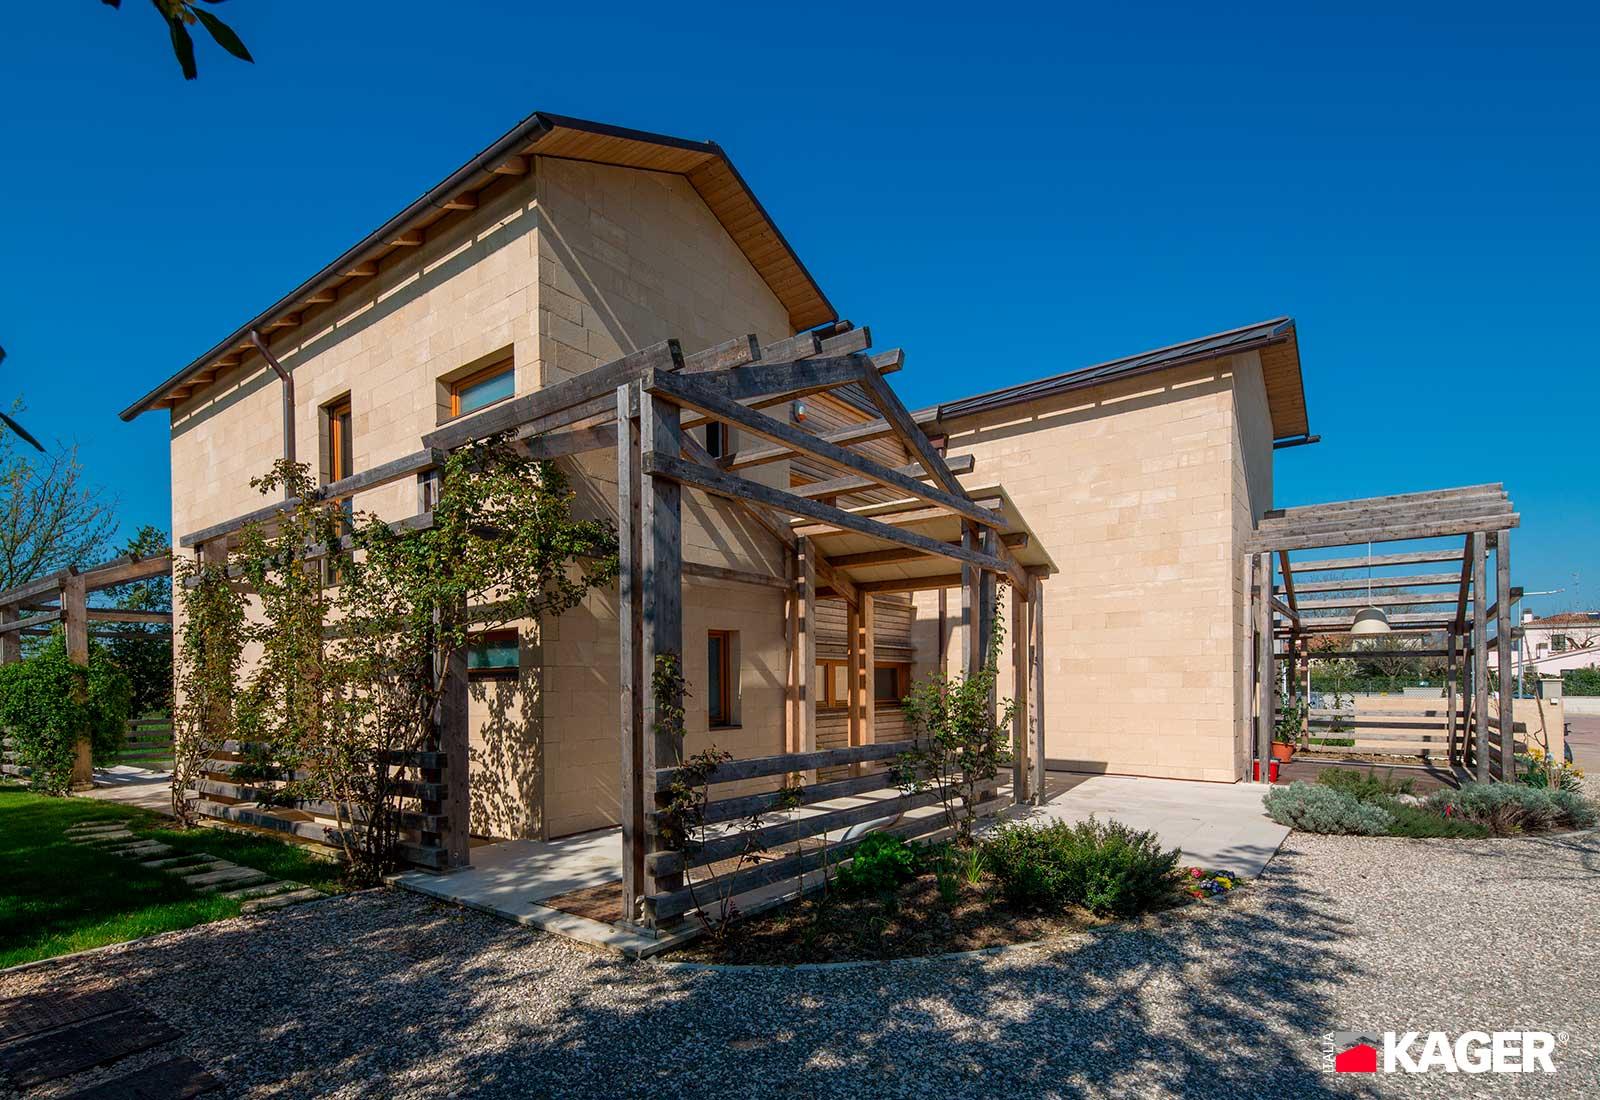 Casa-in-legno-Forli-Kager-Italia-03